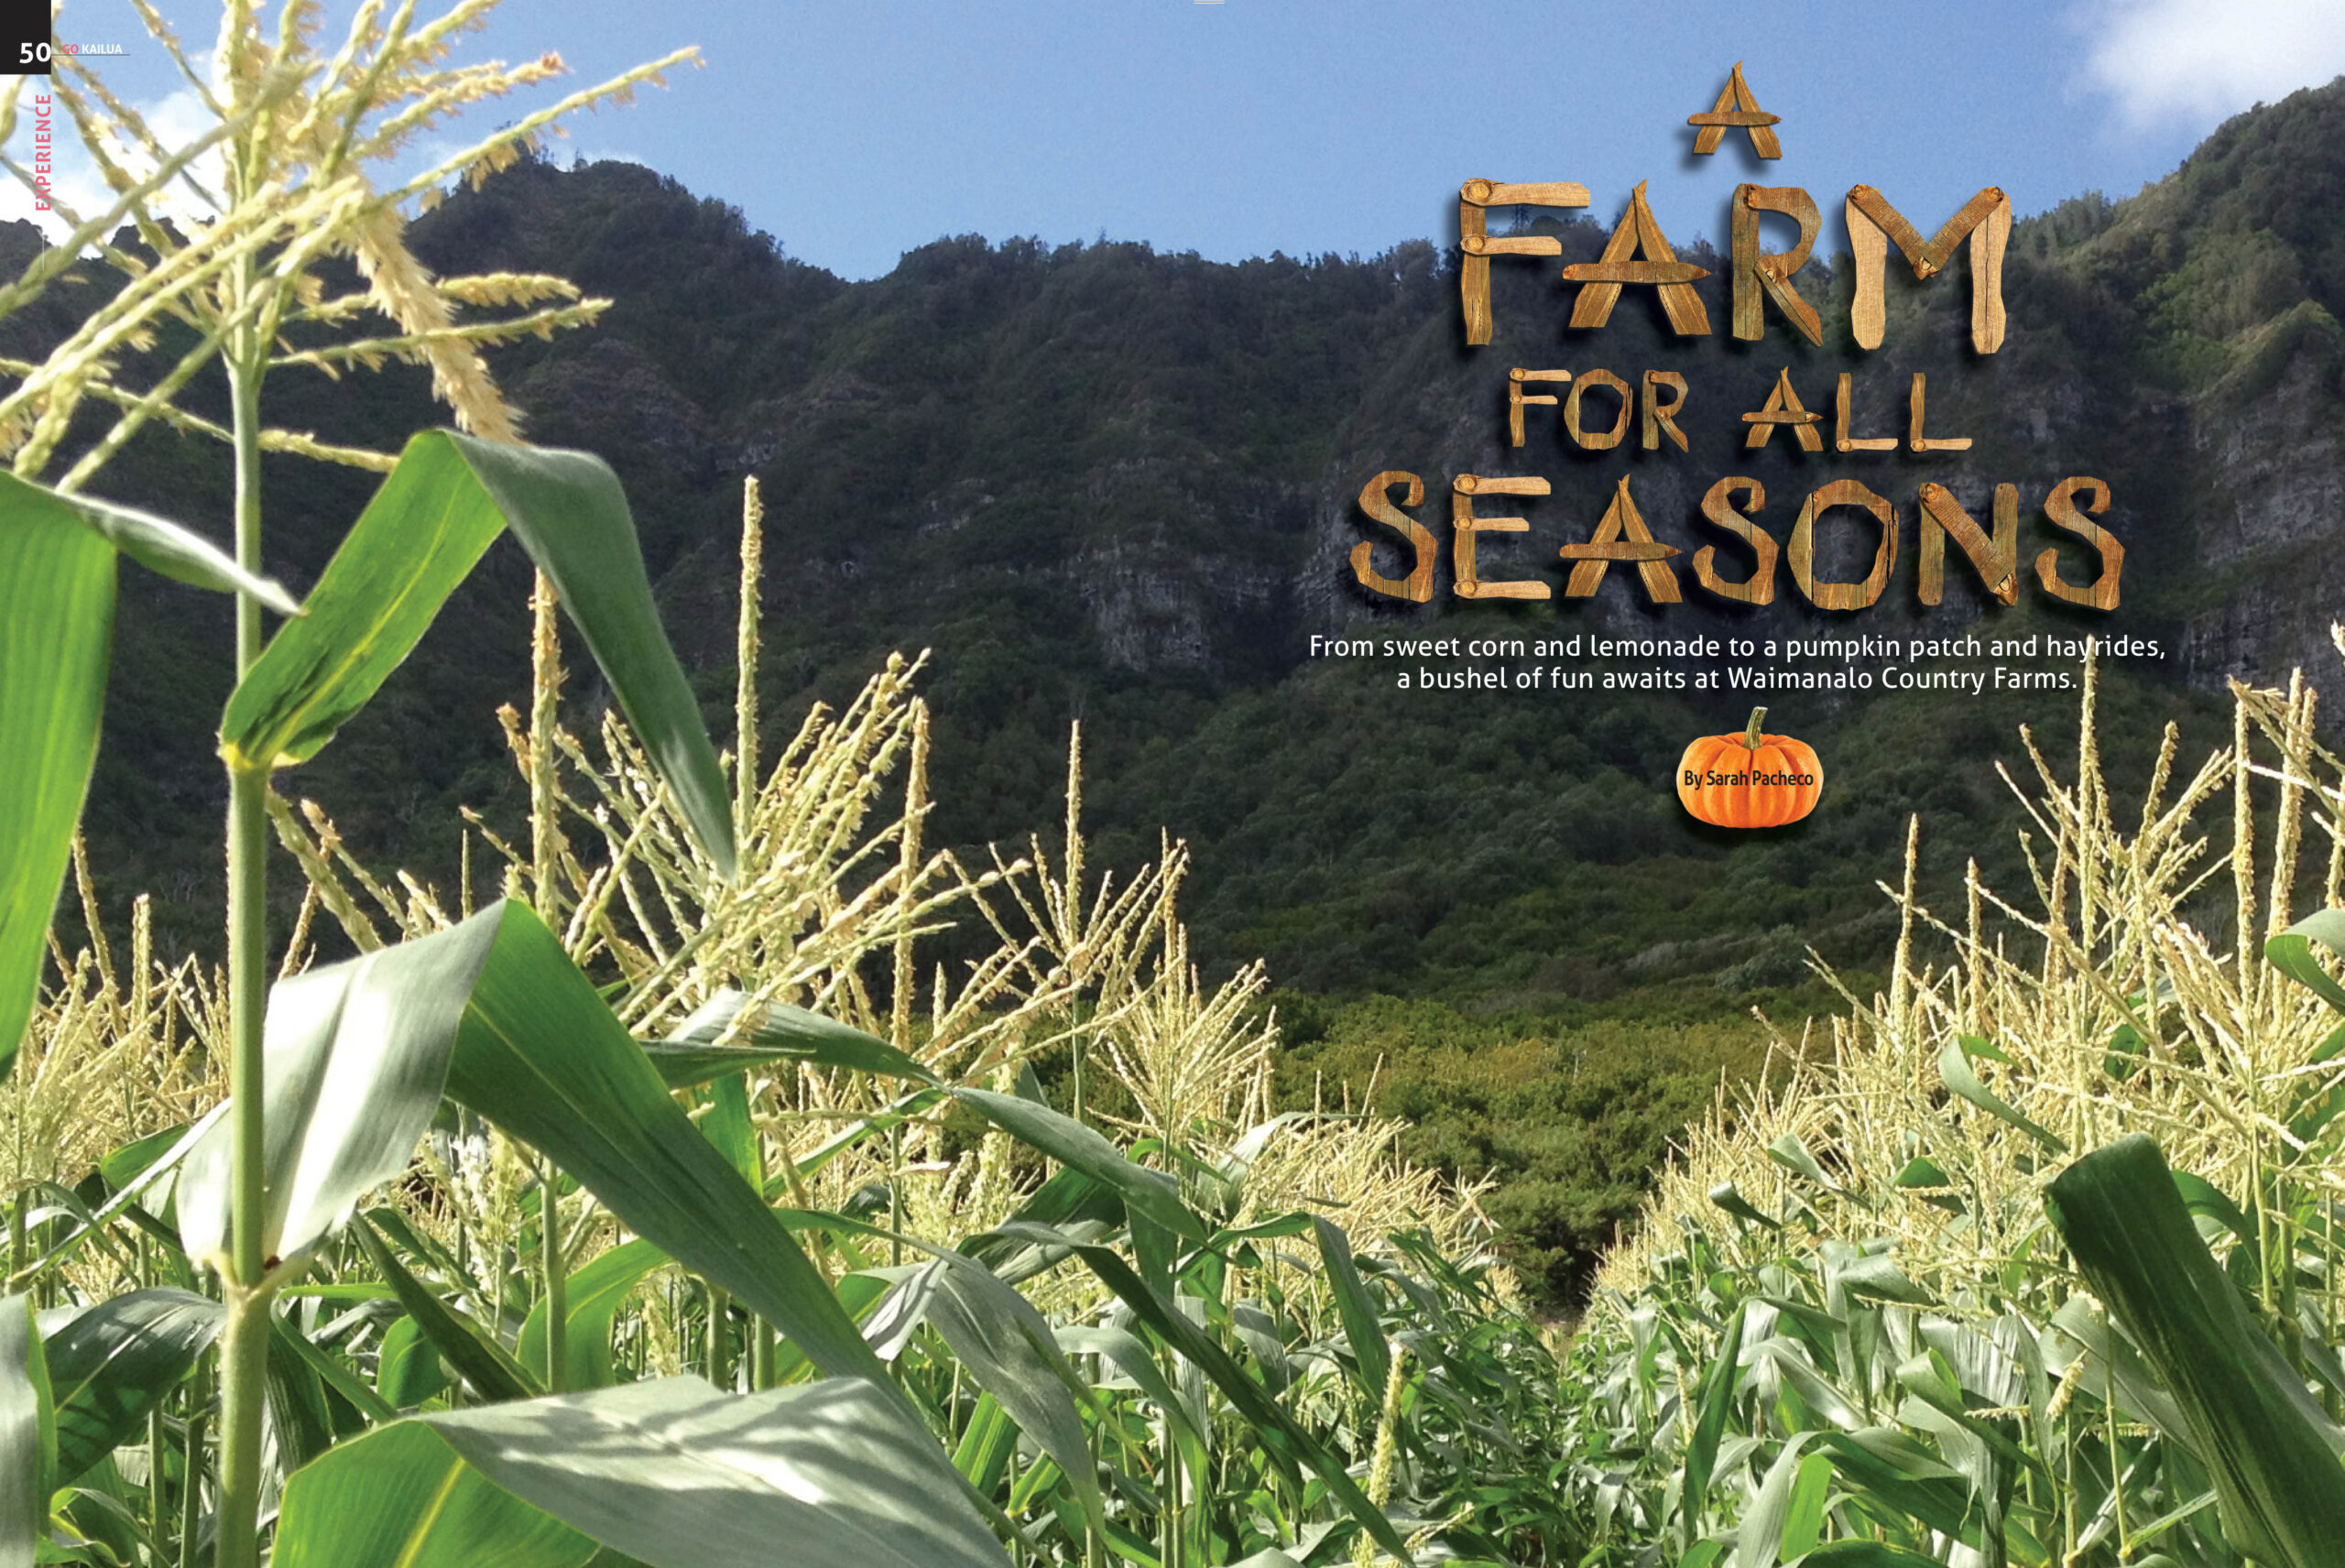 Farm-for-all-Seasons-scaled.jpg